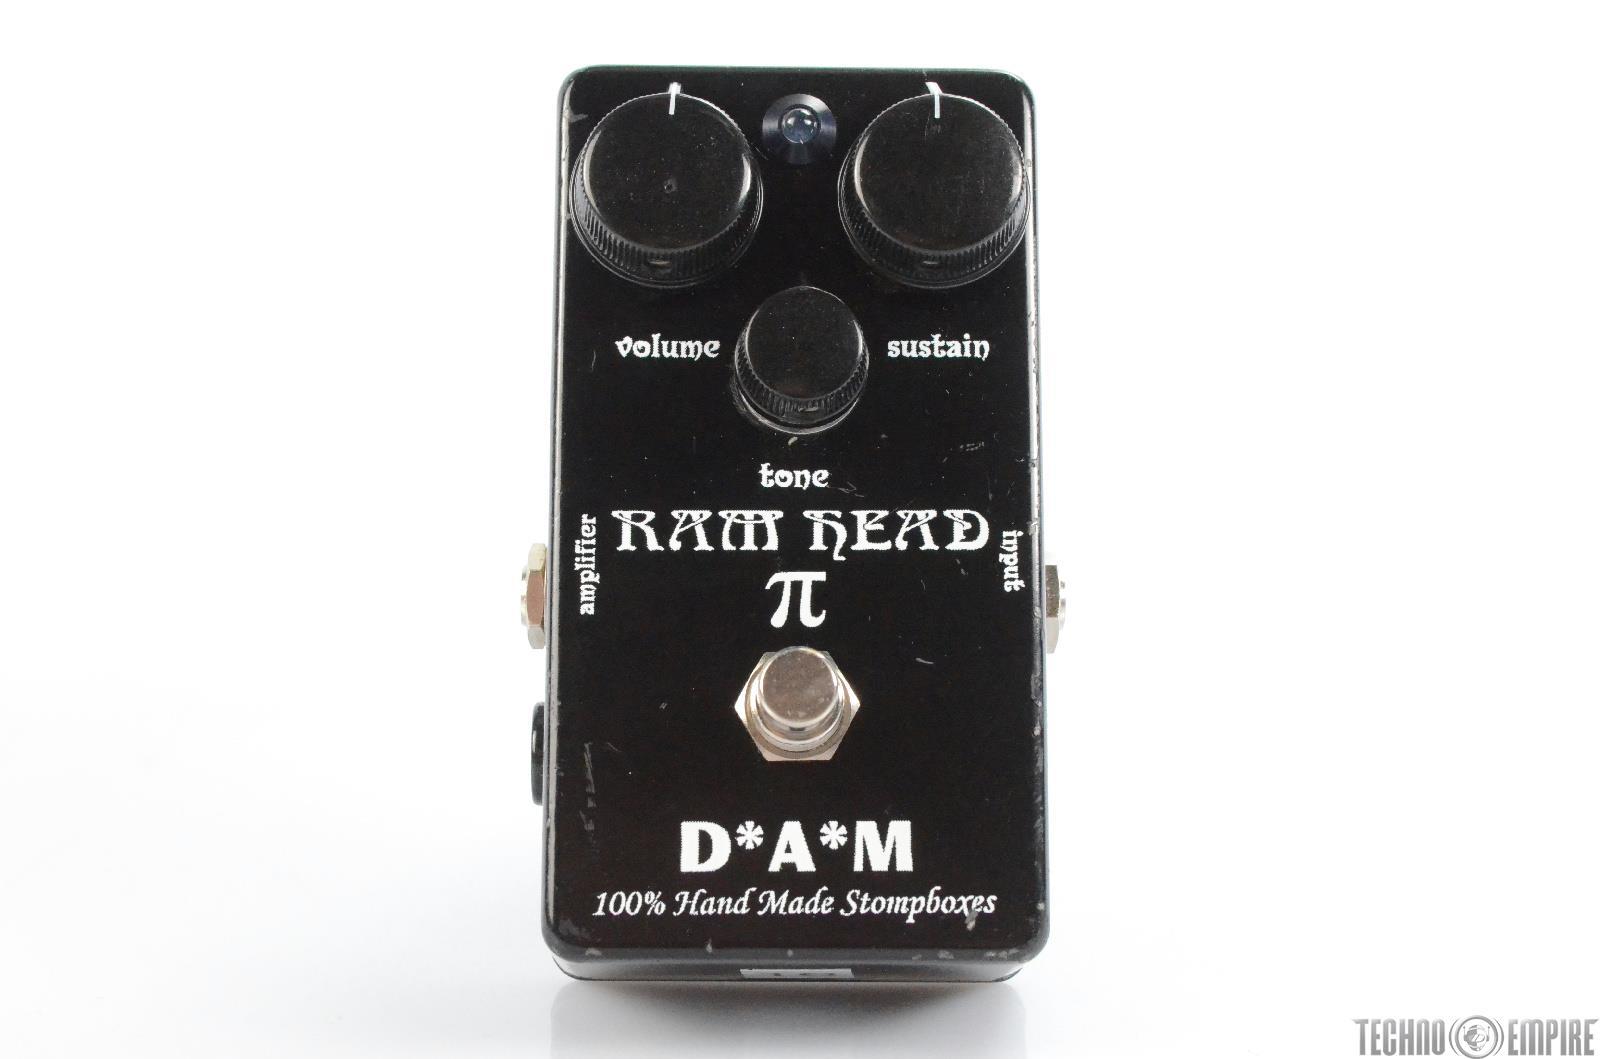 D*A*M Ram Head PI Handmade Big Muff Clone Pedal Owned by Matt Hyde #30087